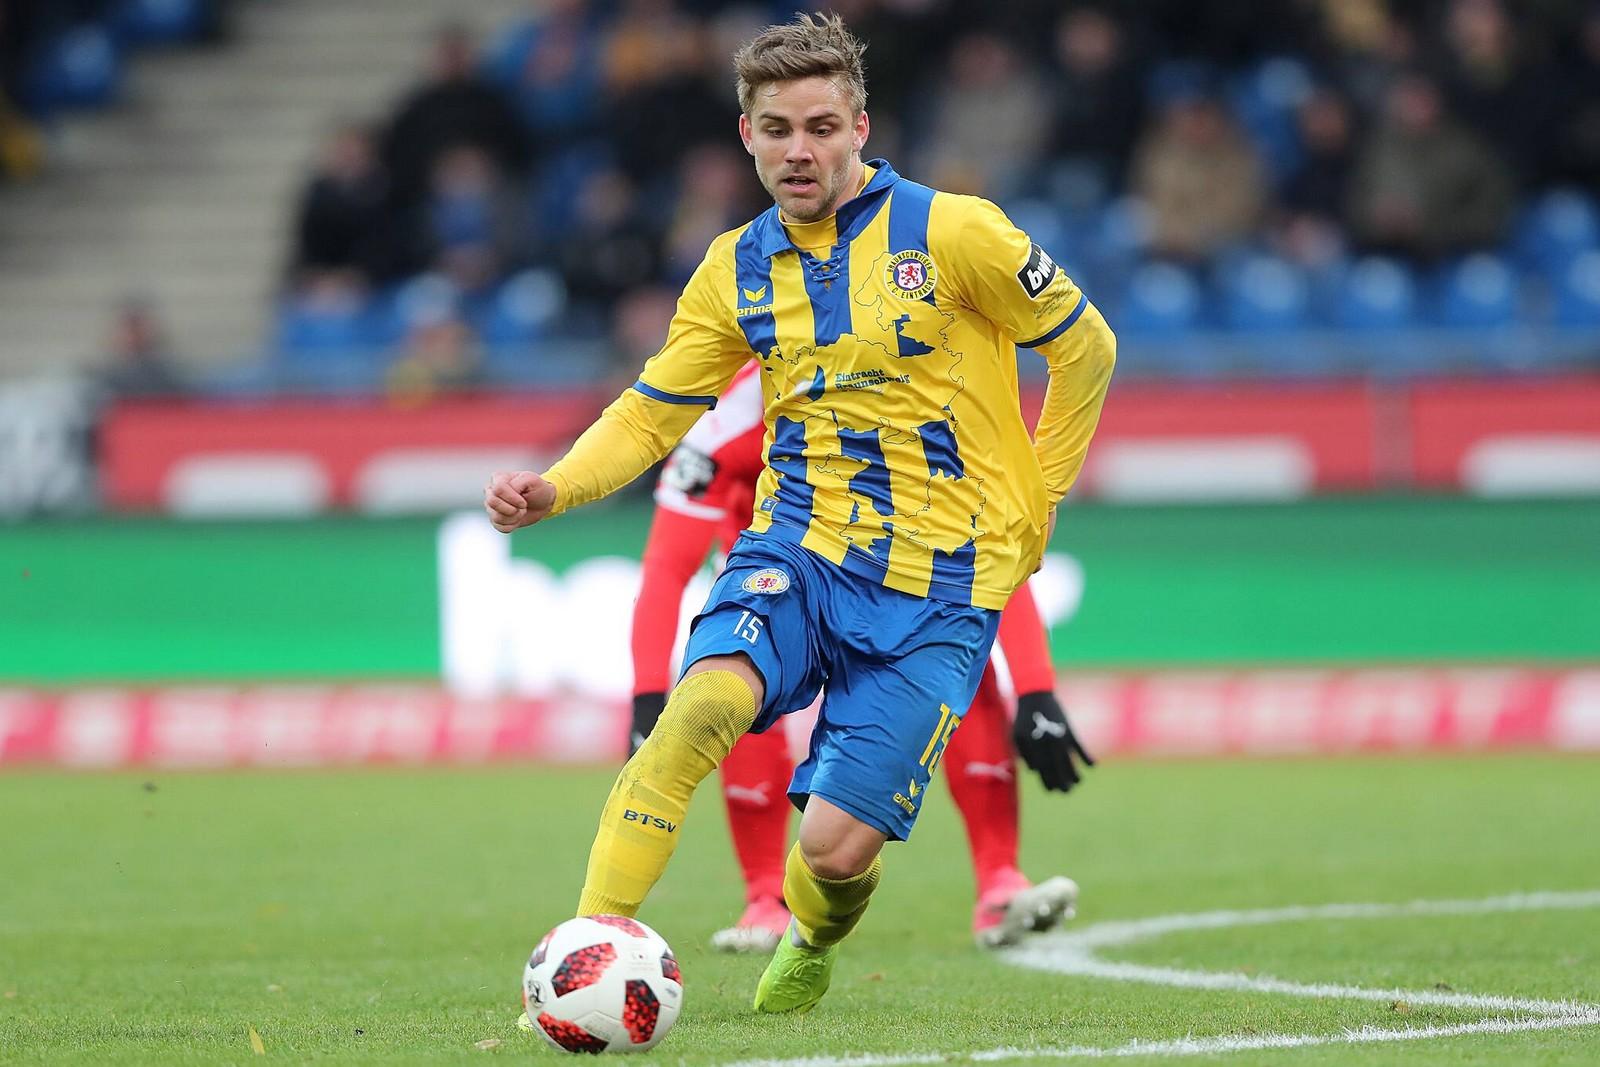 Christoffer Nyman am Ball in der 3. Liga.